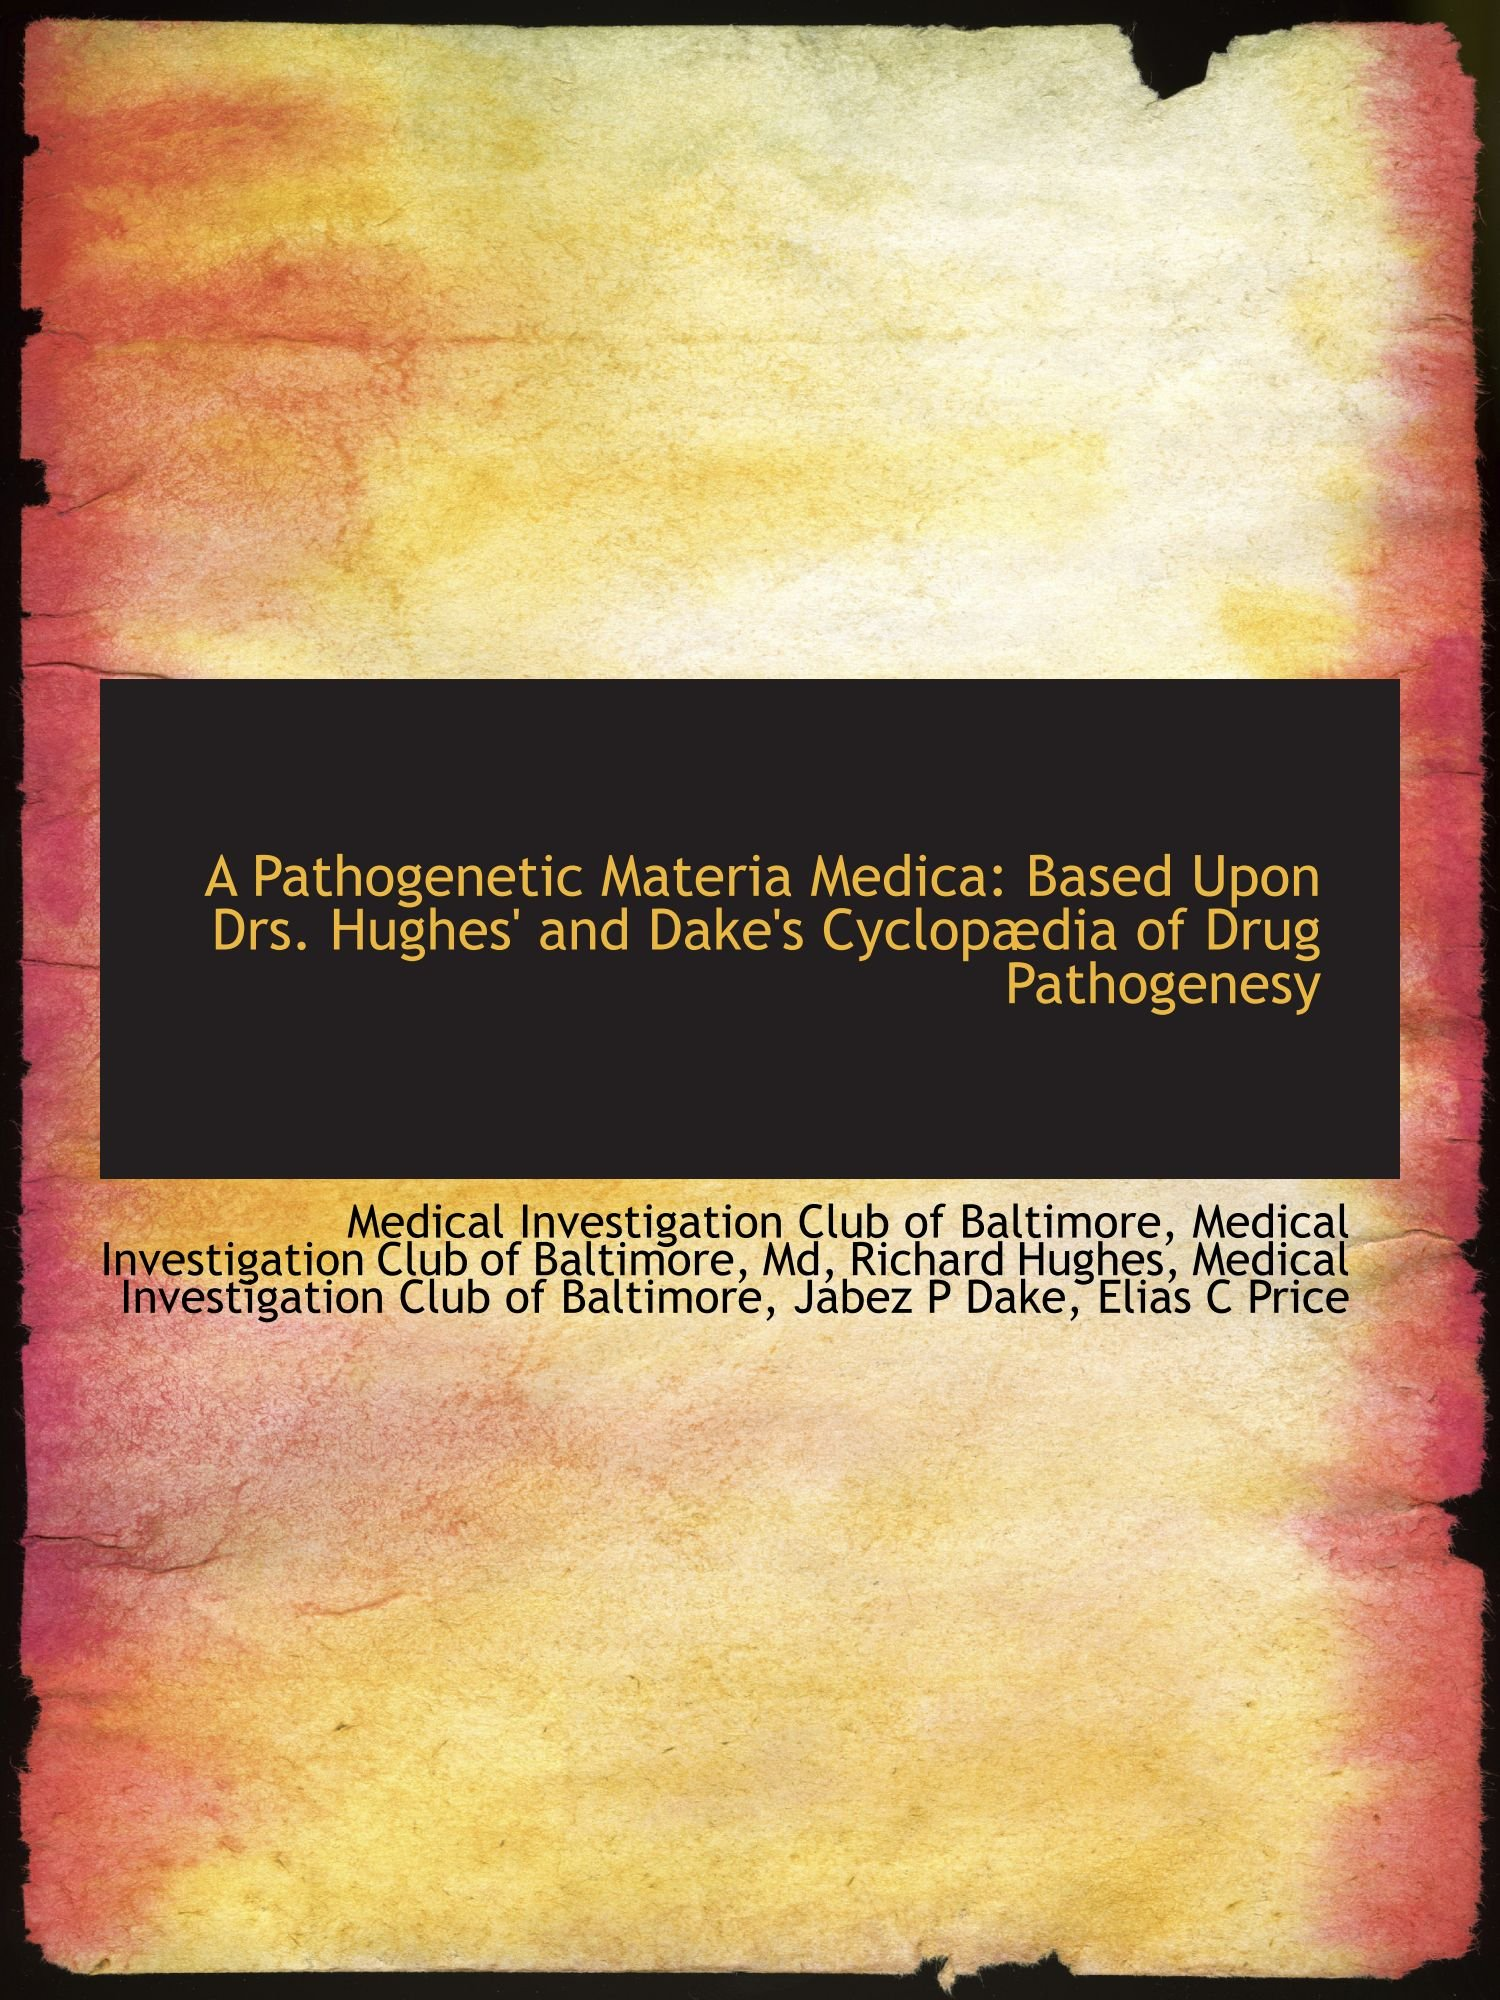 A Pathogenetic Materia Medica: Based Upon Drs. Hughes' and Dake's Cyclopædia of Drug Pathogenesy pdf epub